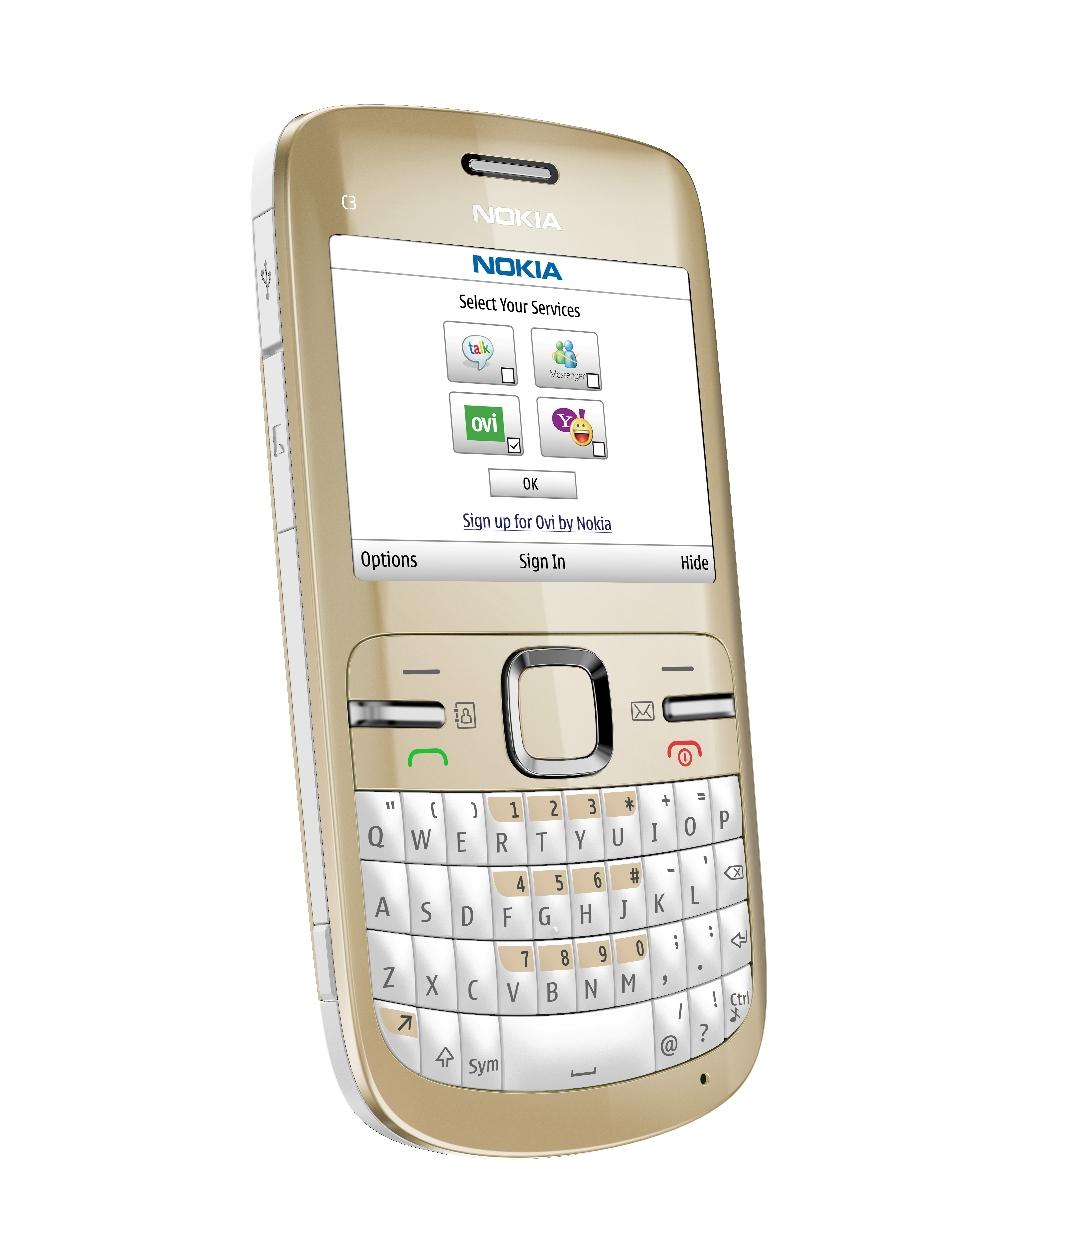 http://2.bp.blogspot.com/-vFib1UokIM0/Tiry7PxZduI/AAAAAAAAA-k/bPr3hGgyPM4/s1600/Nokia_C3_02.jpg